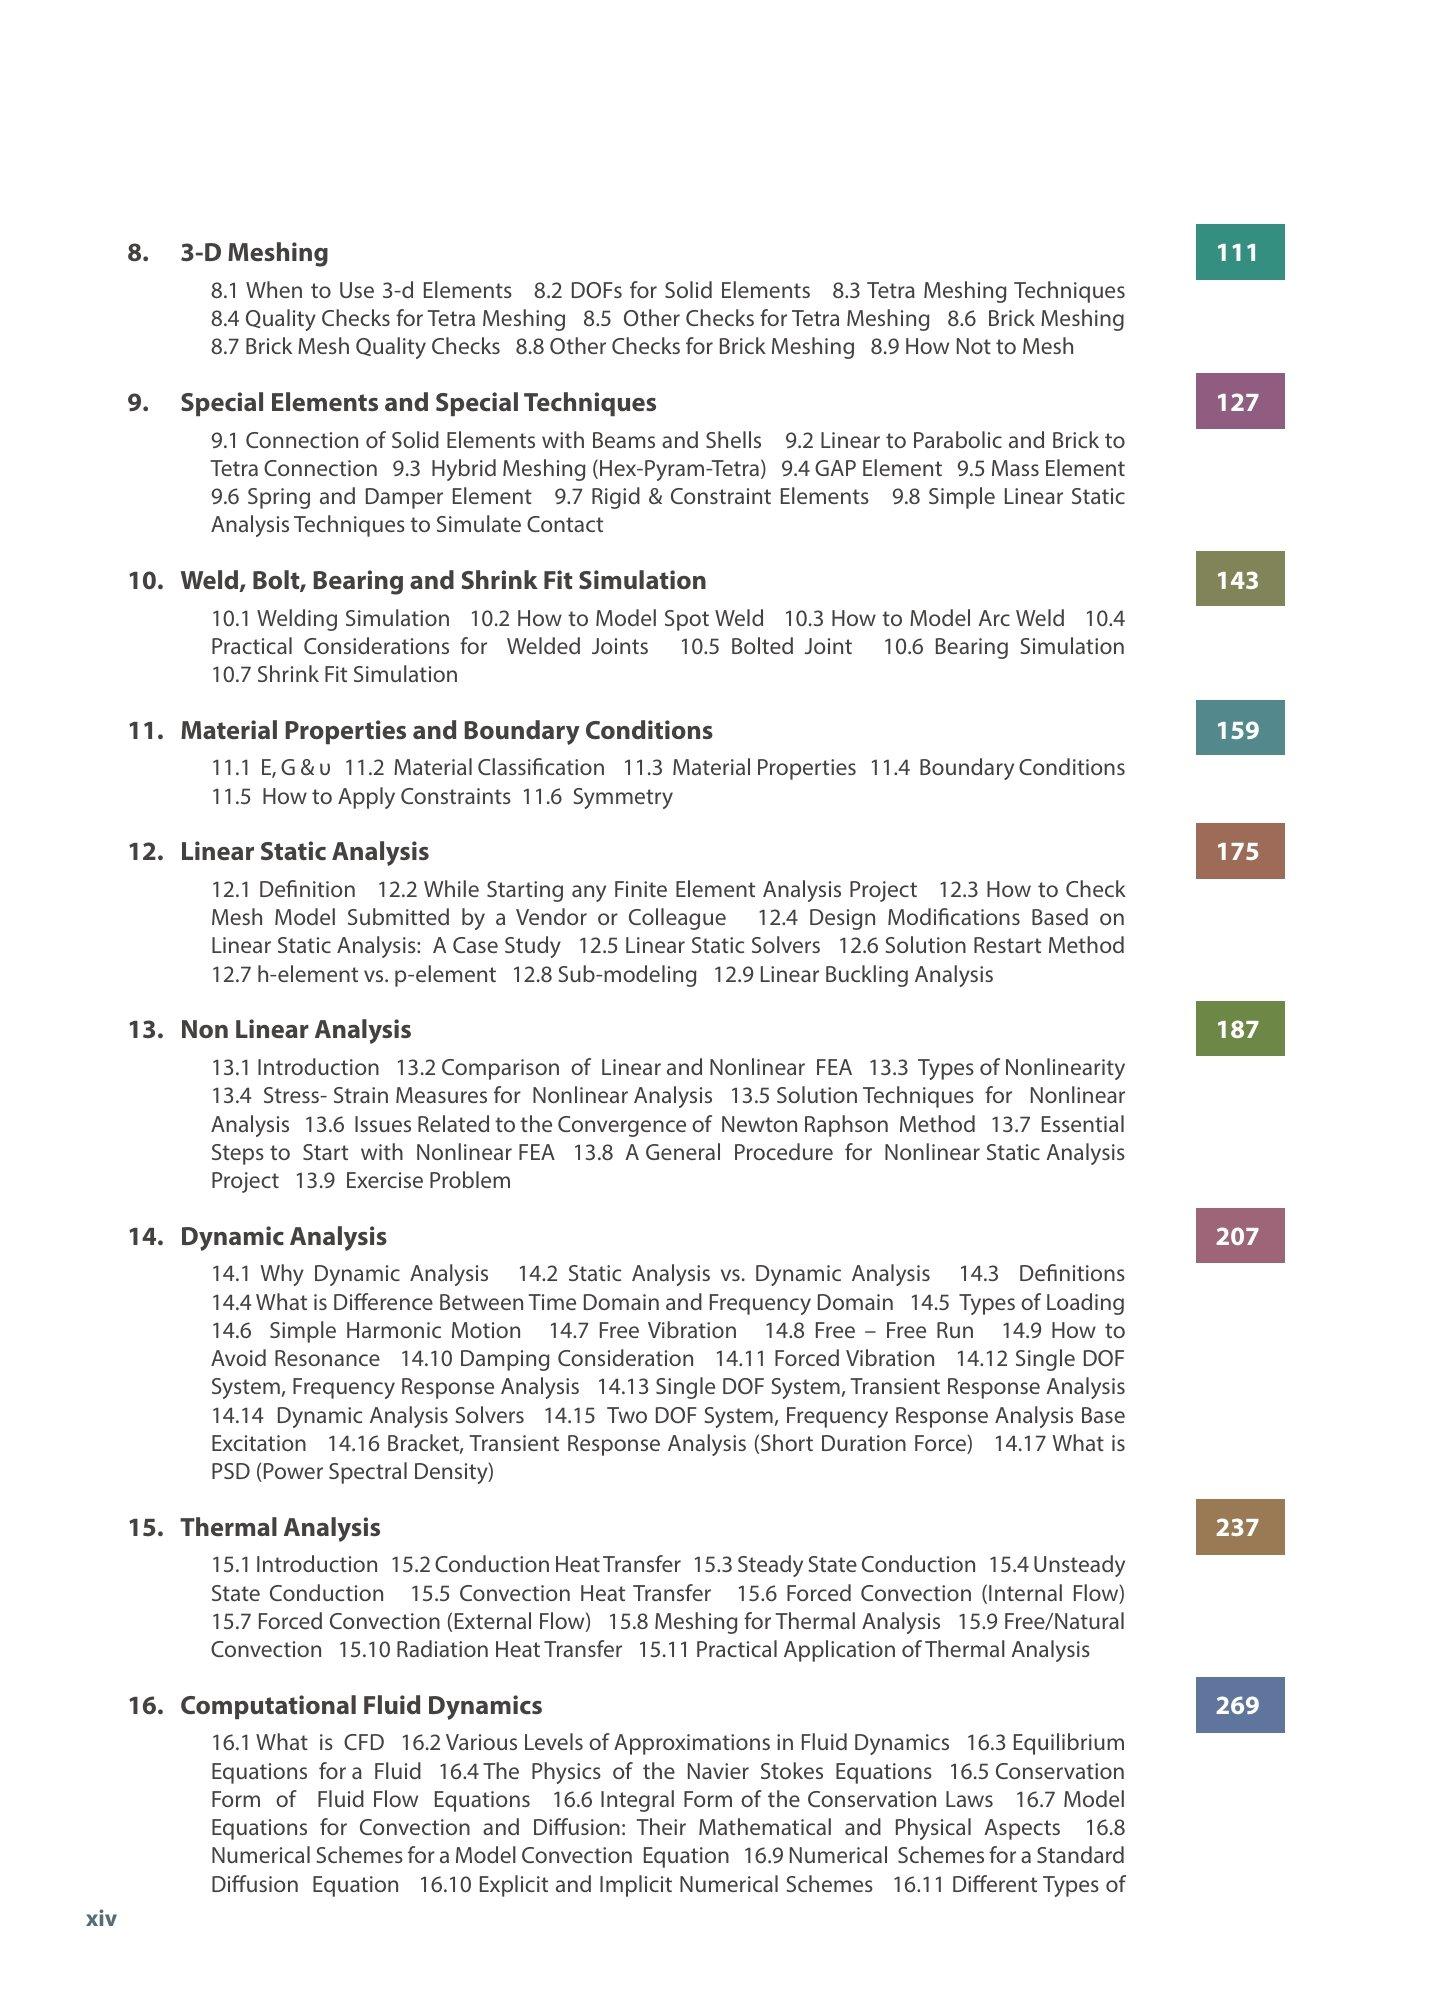 Practical Finite Element Analysis: Nitin S Gokhale, Sanjeev